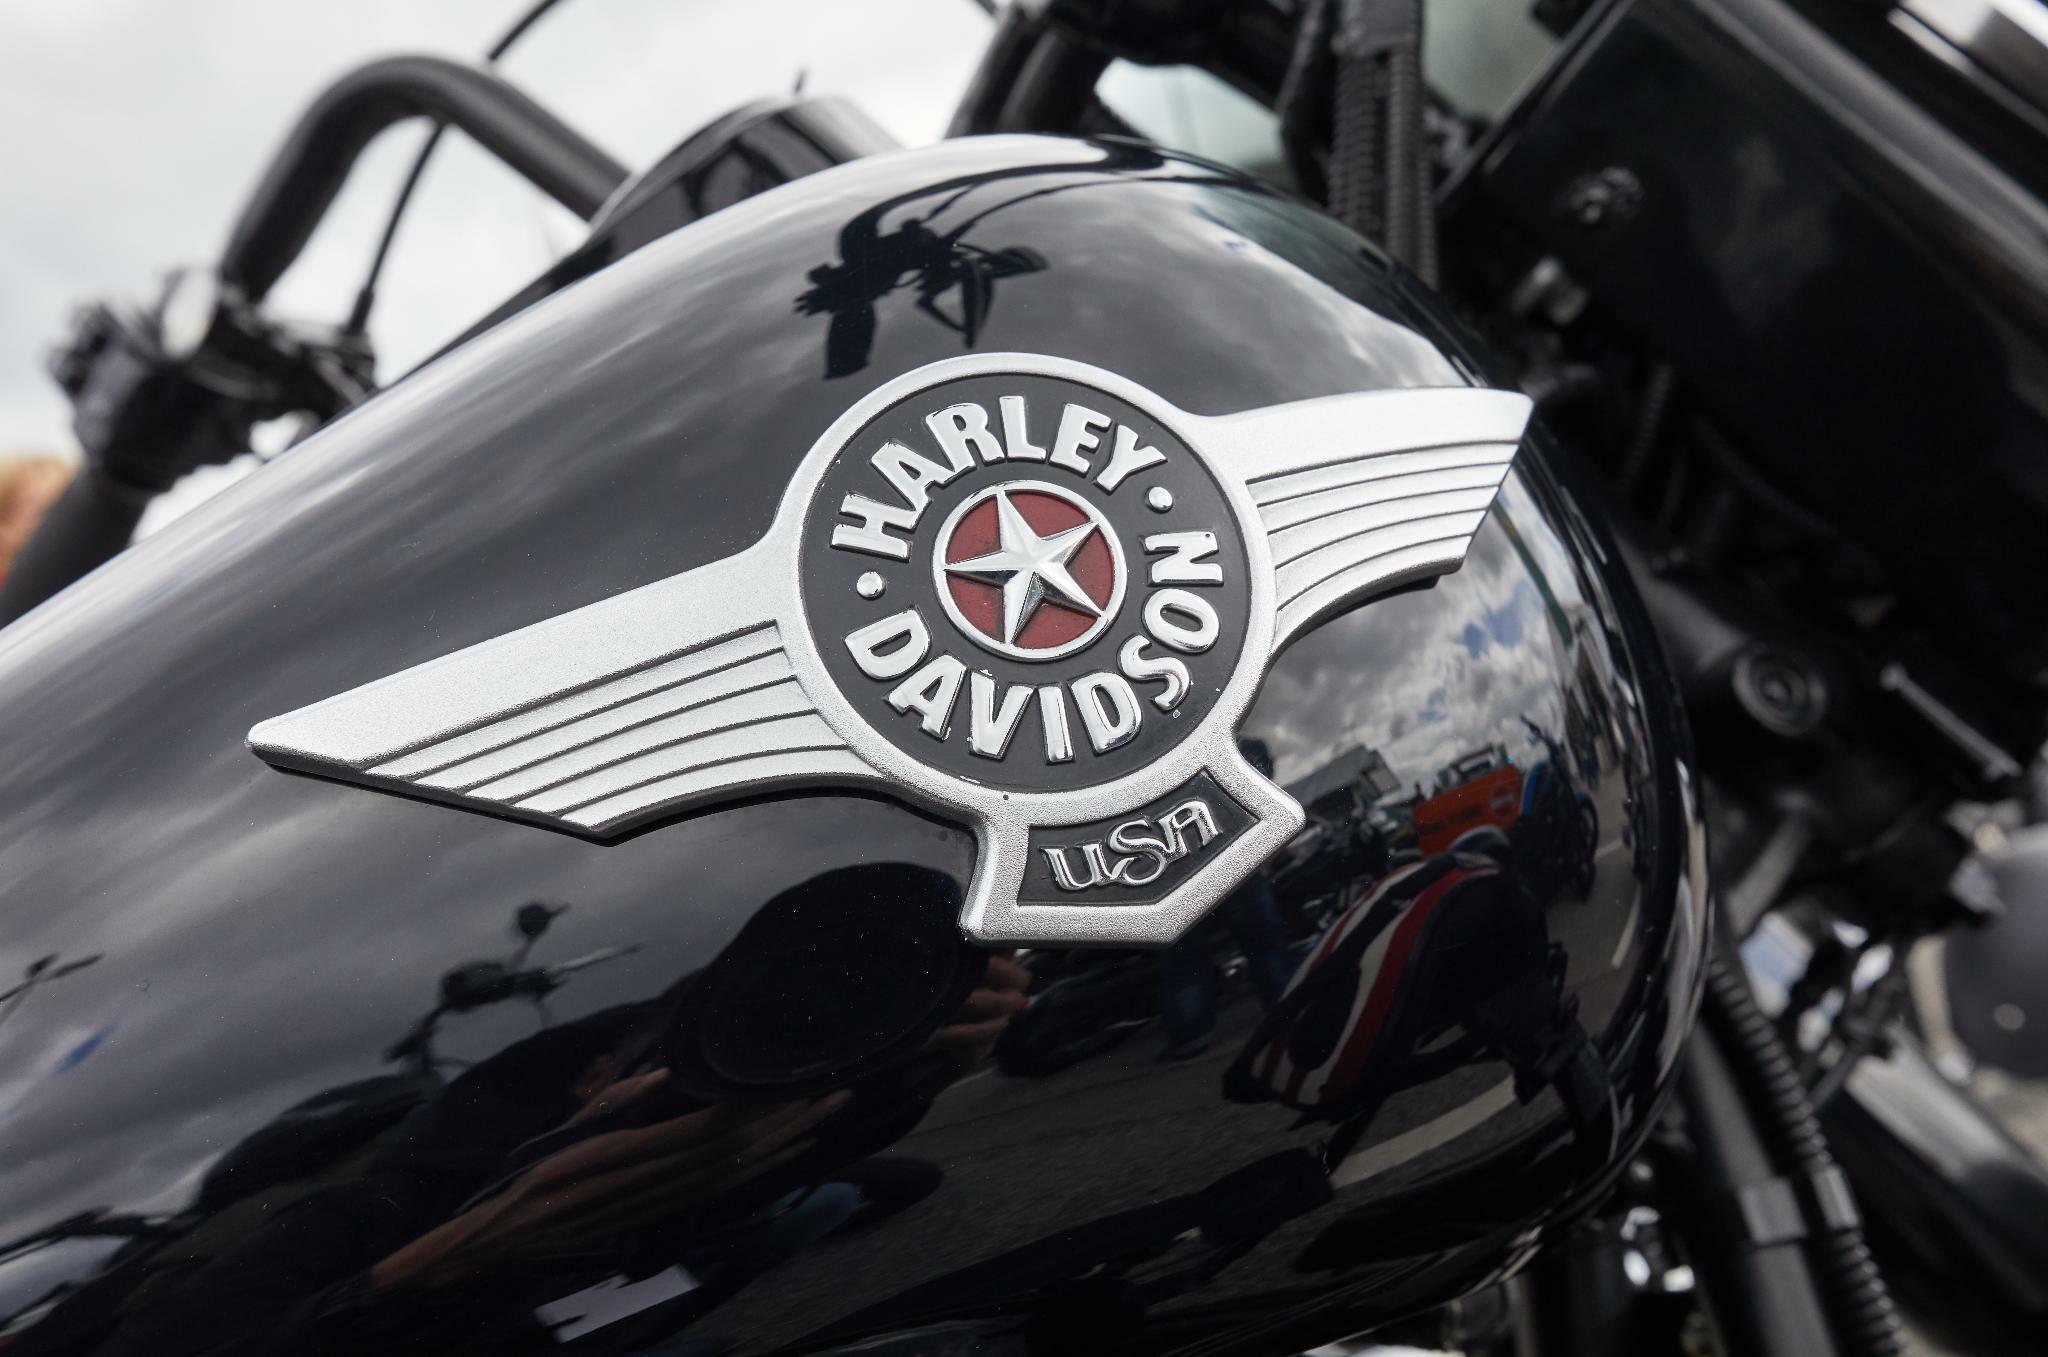 Harley-Davidson verlagert US-Produktion wegen EU-Strafzöllen